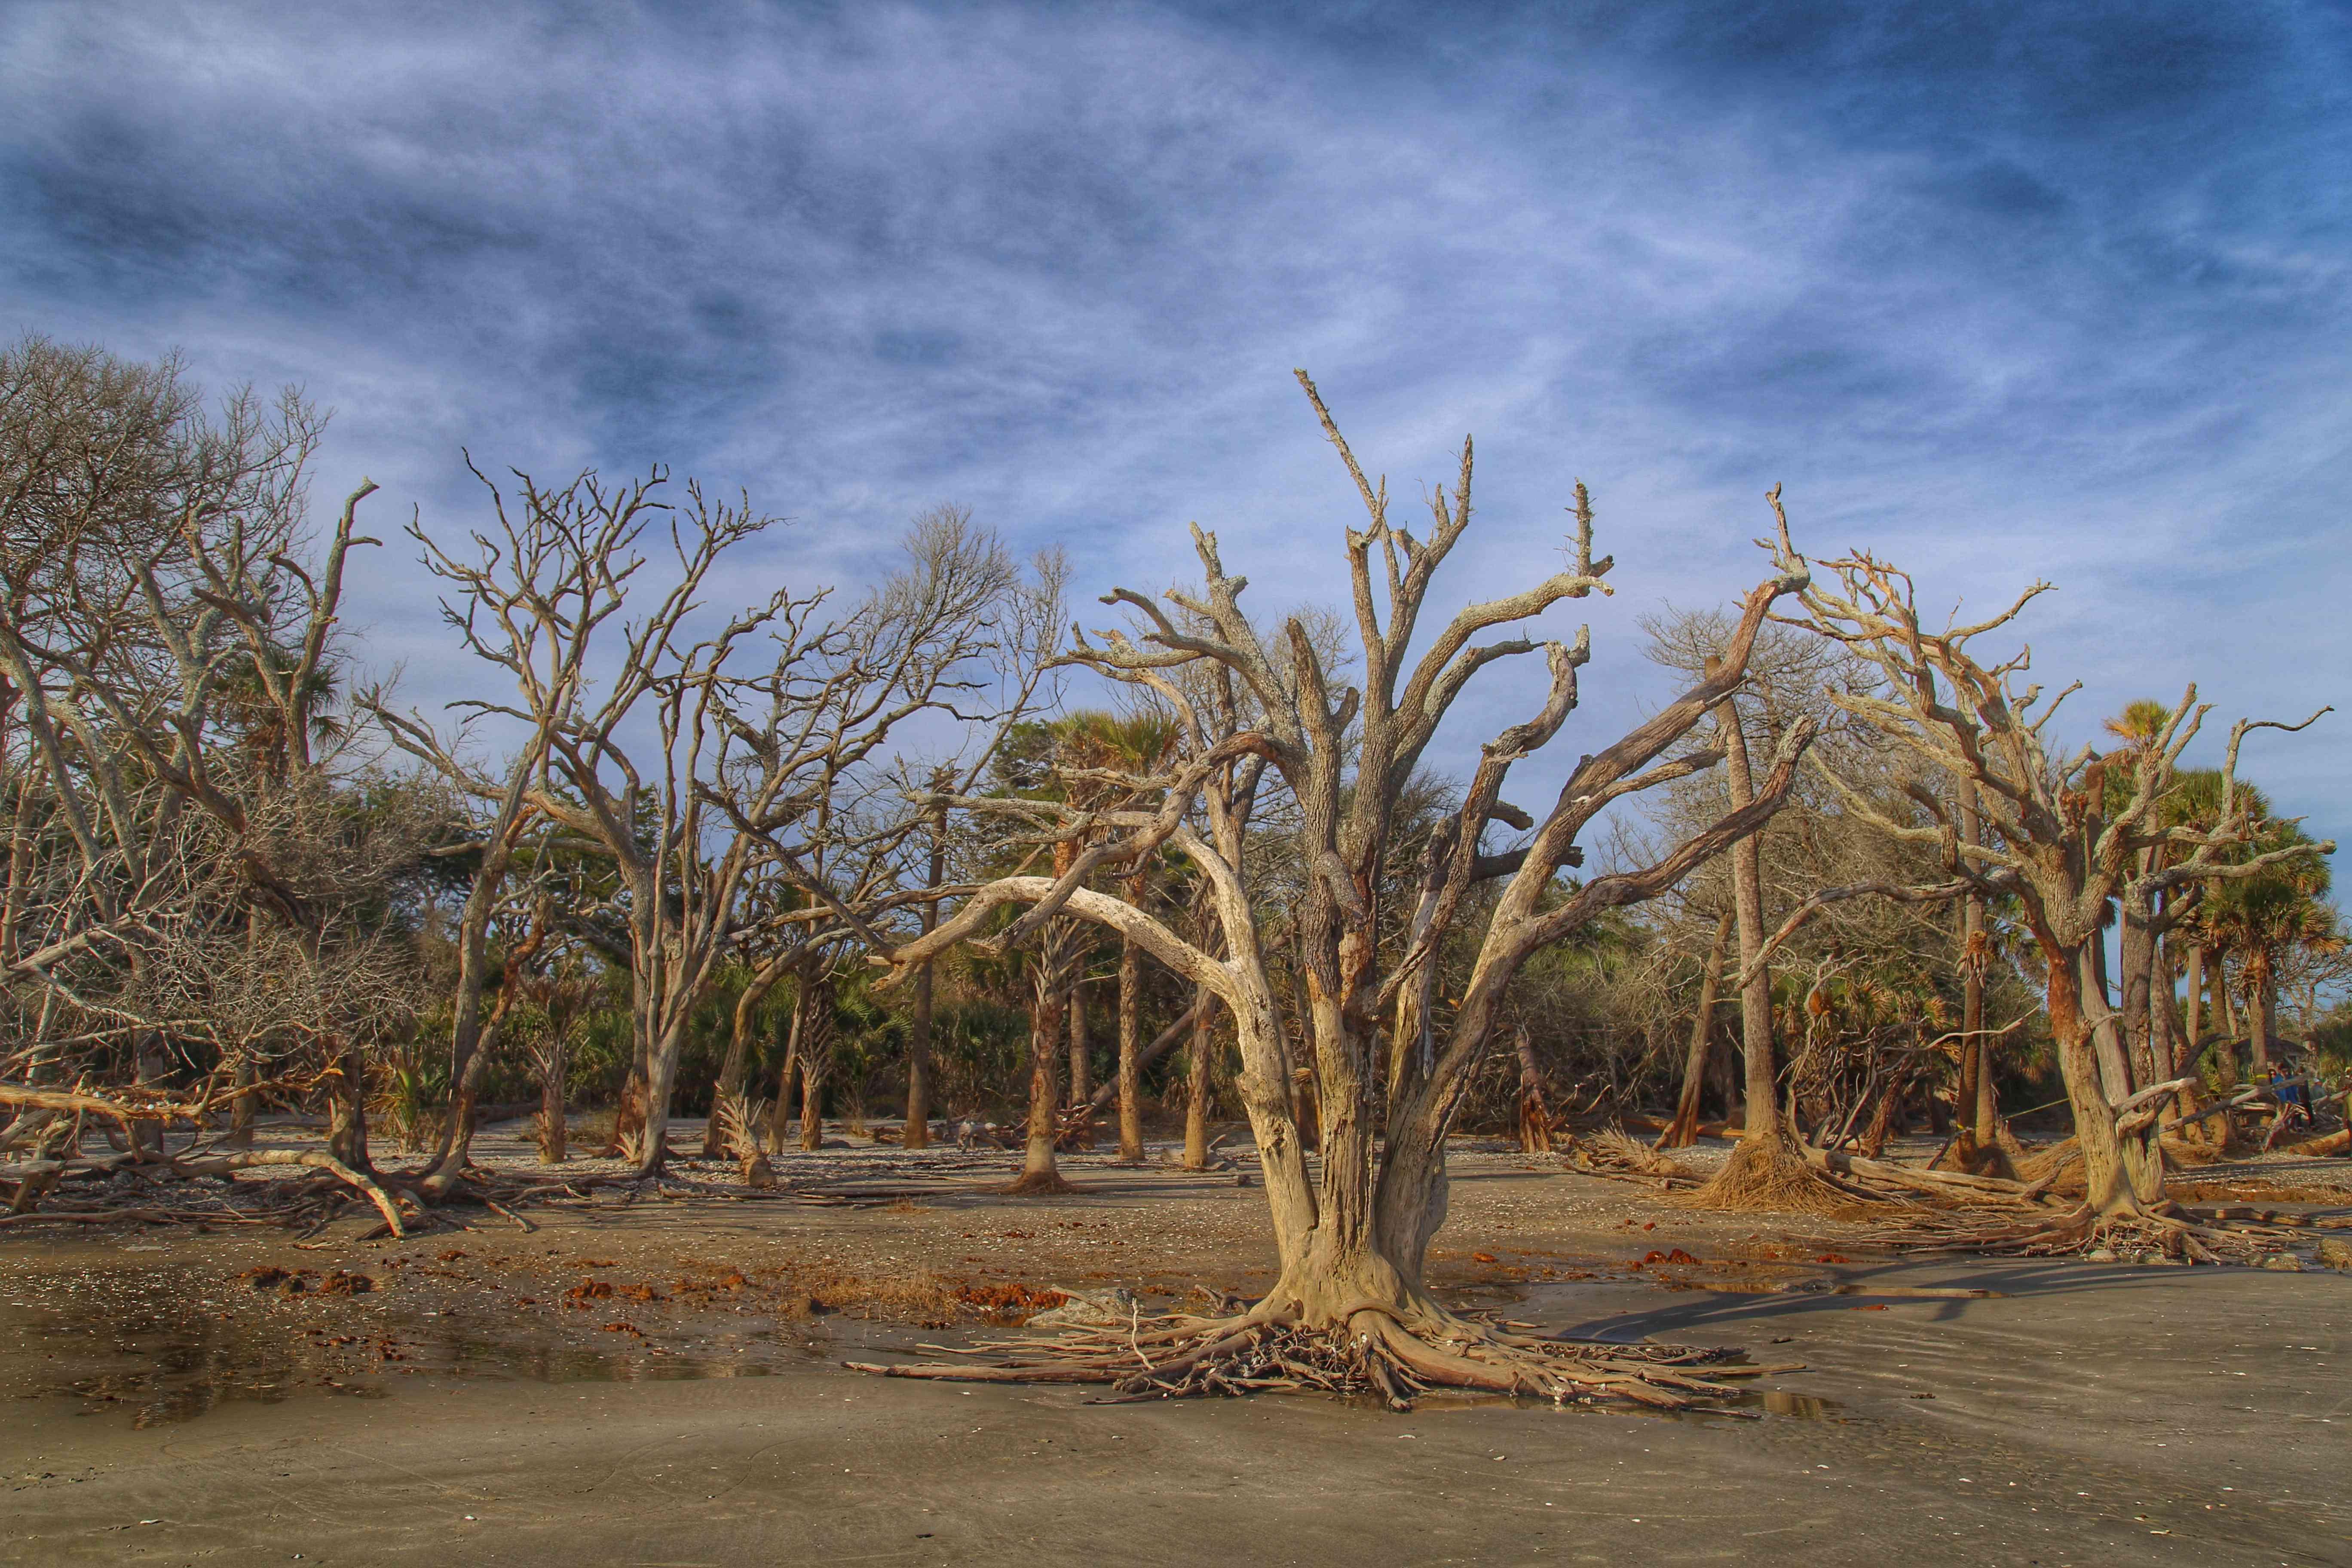 Bare trees on eroded beach at Botany Bay